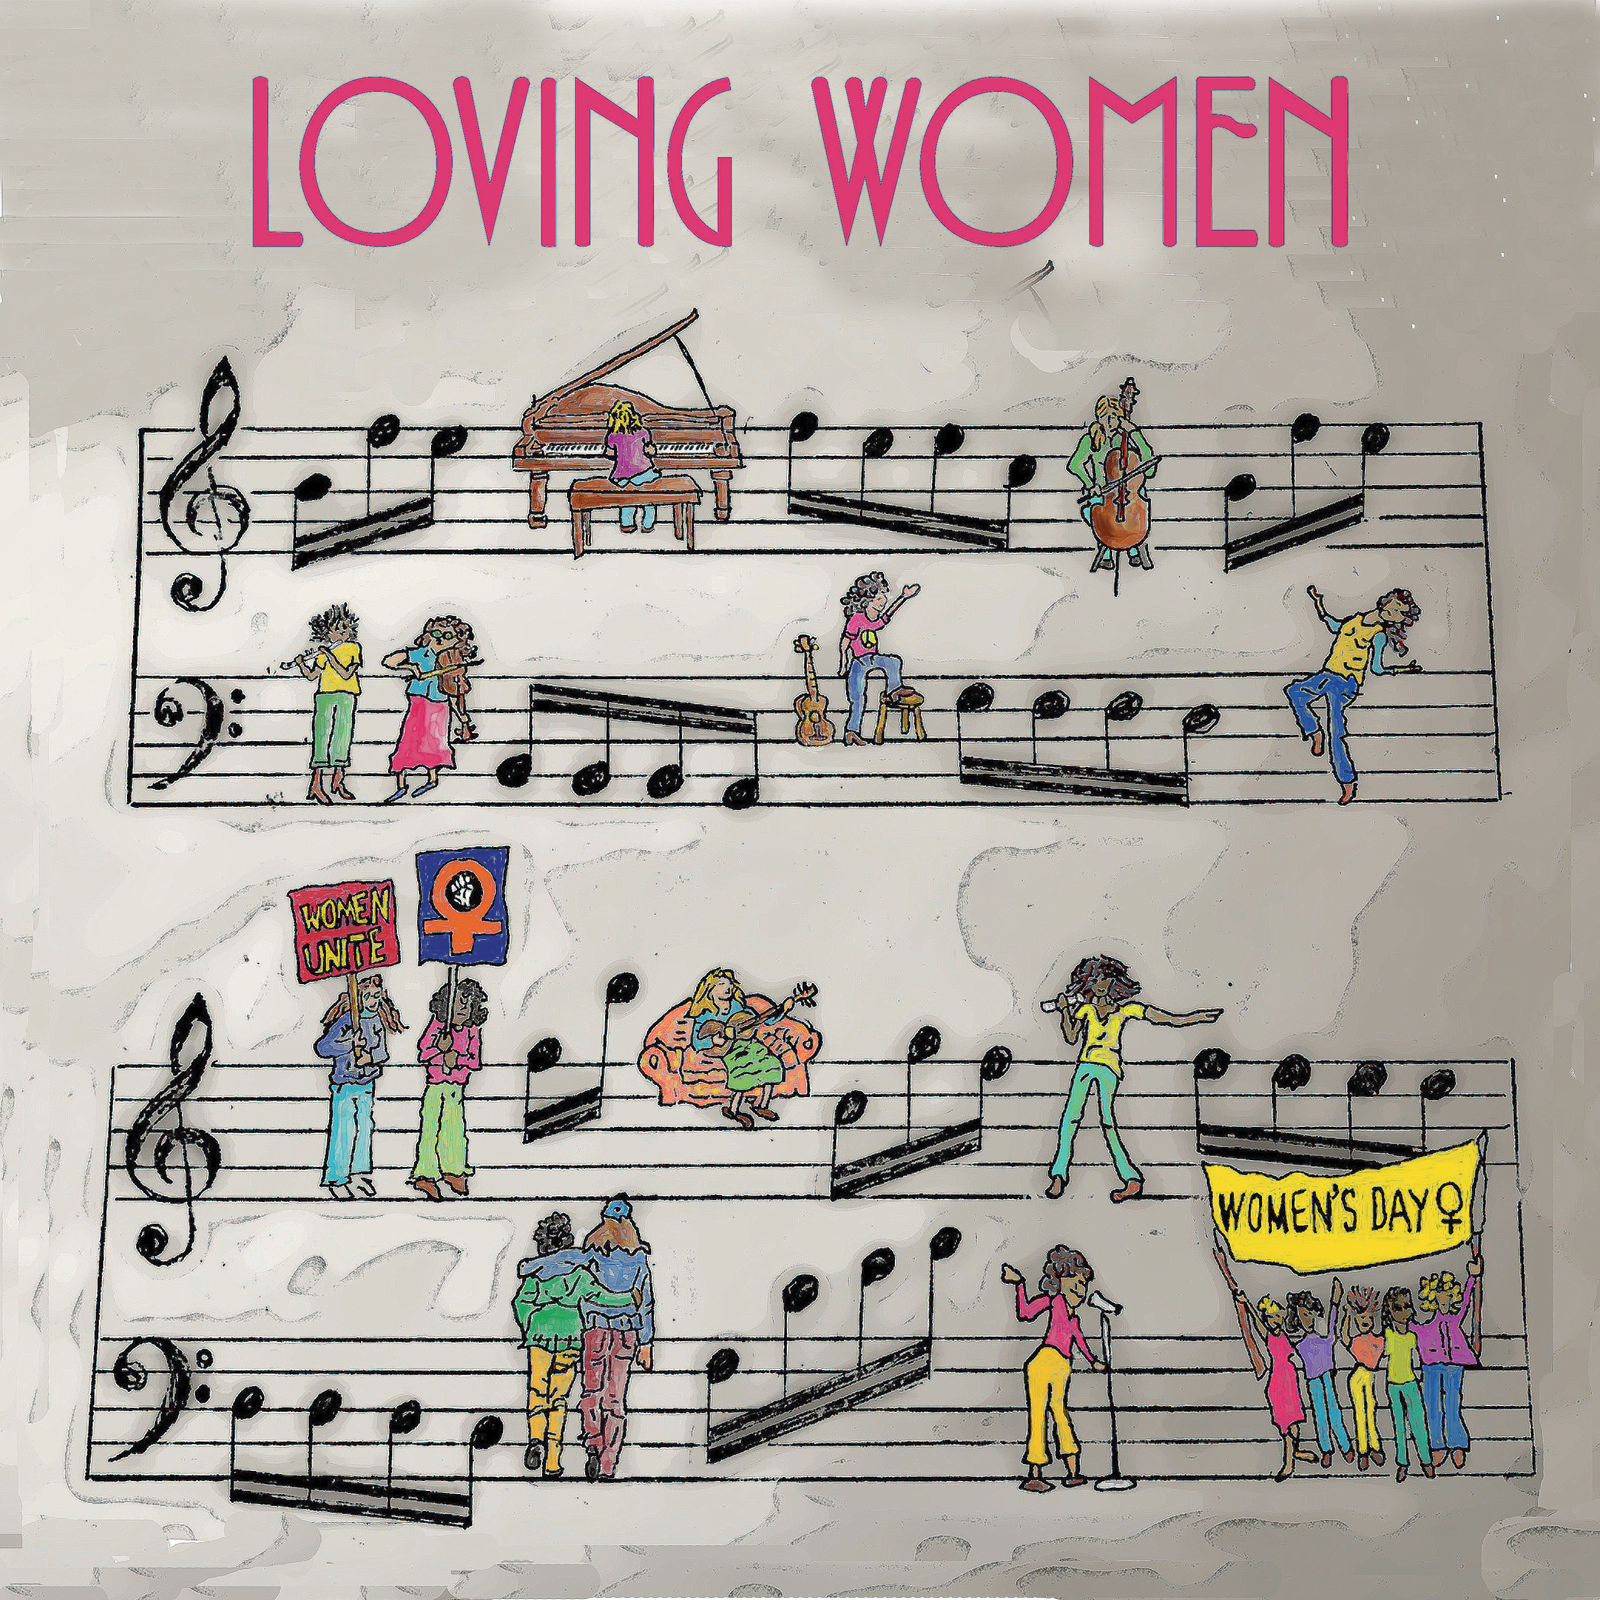 LOVING-WOMEN-DUPLEX-WEBSITE (1).png